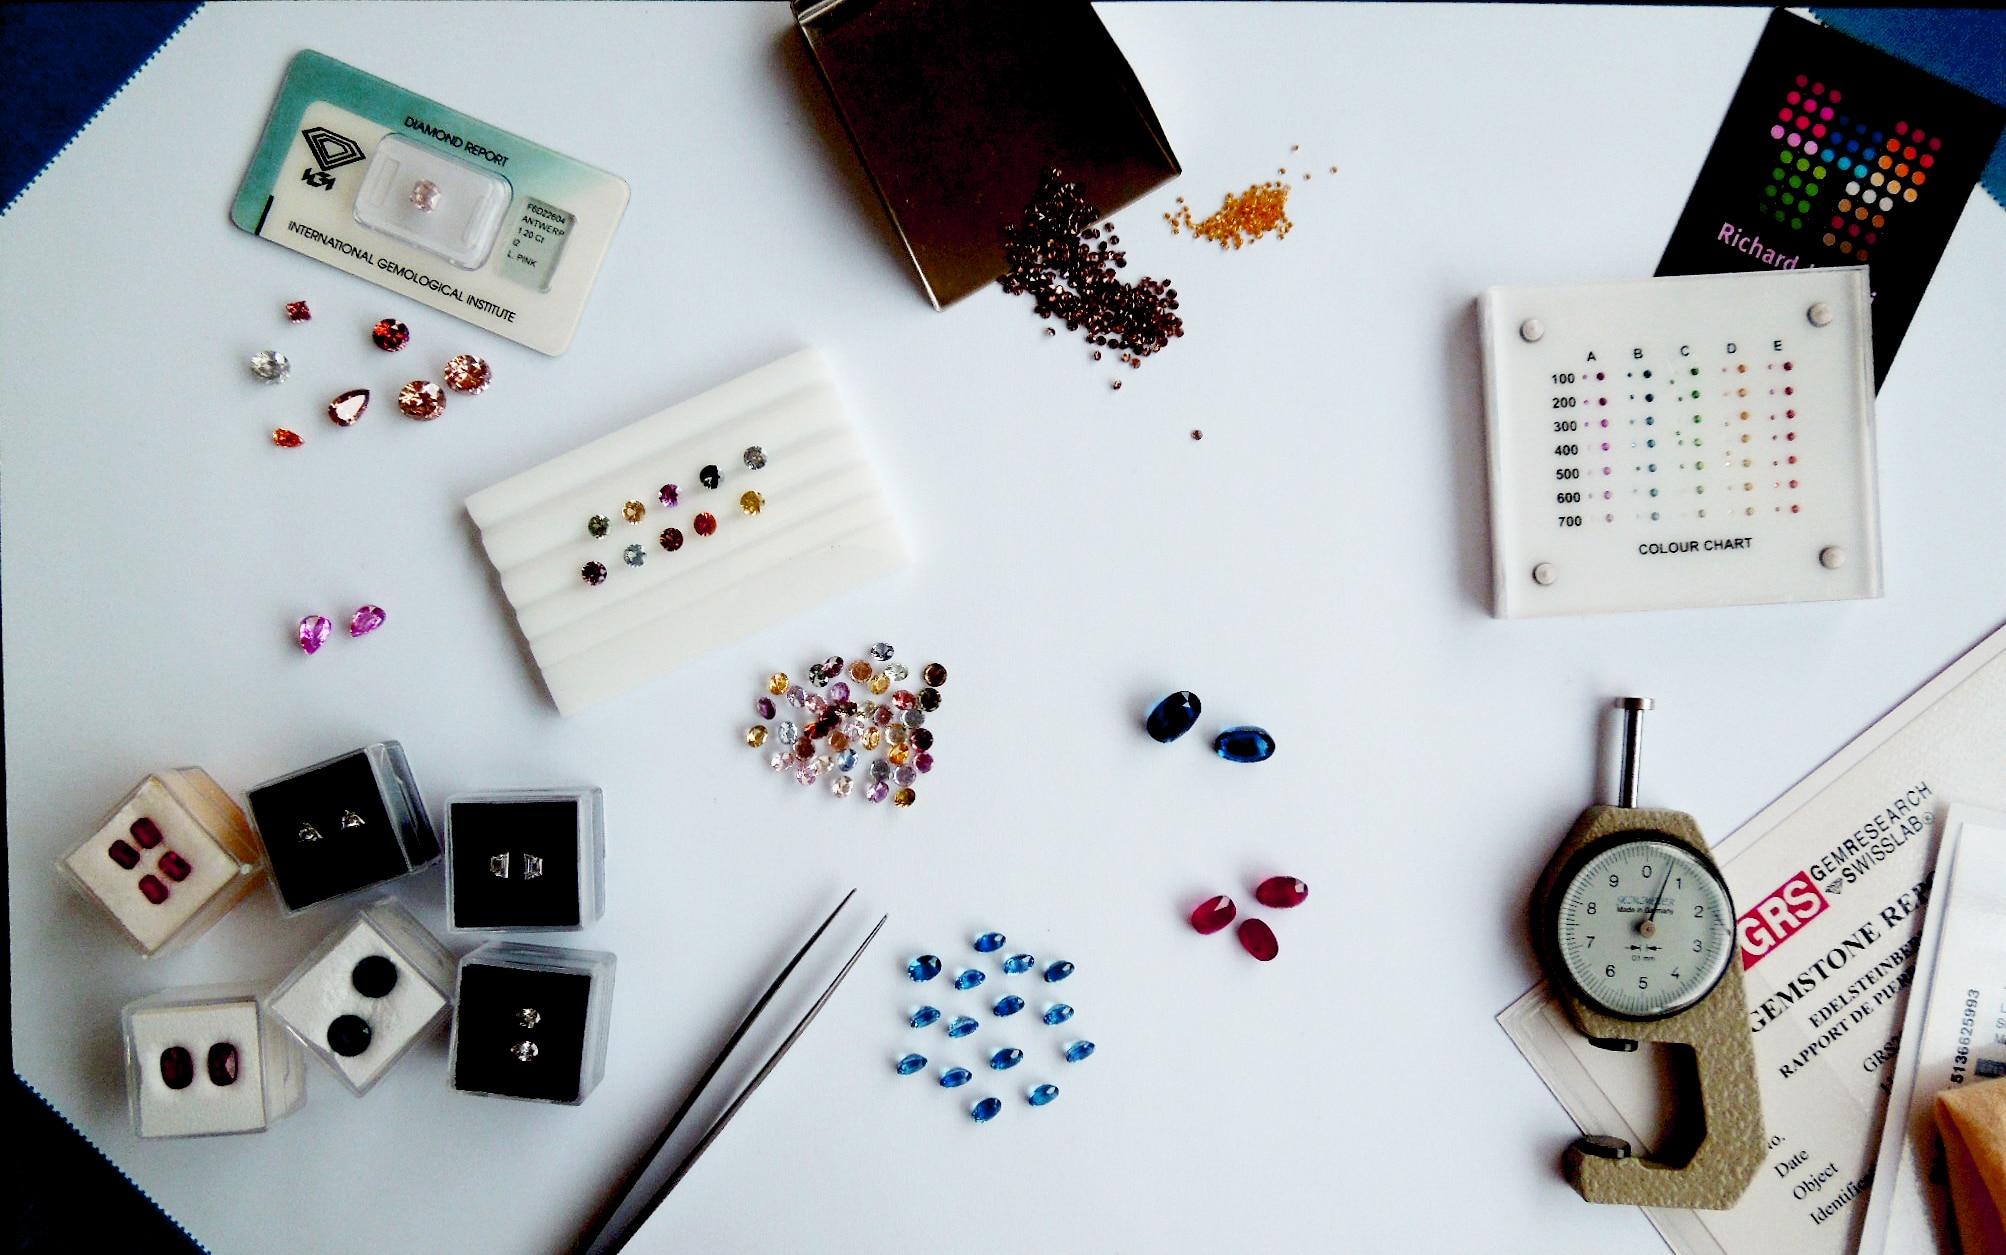 Investing In Coloured Gemstones Even in a Volatile Market